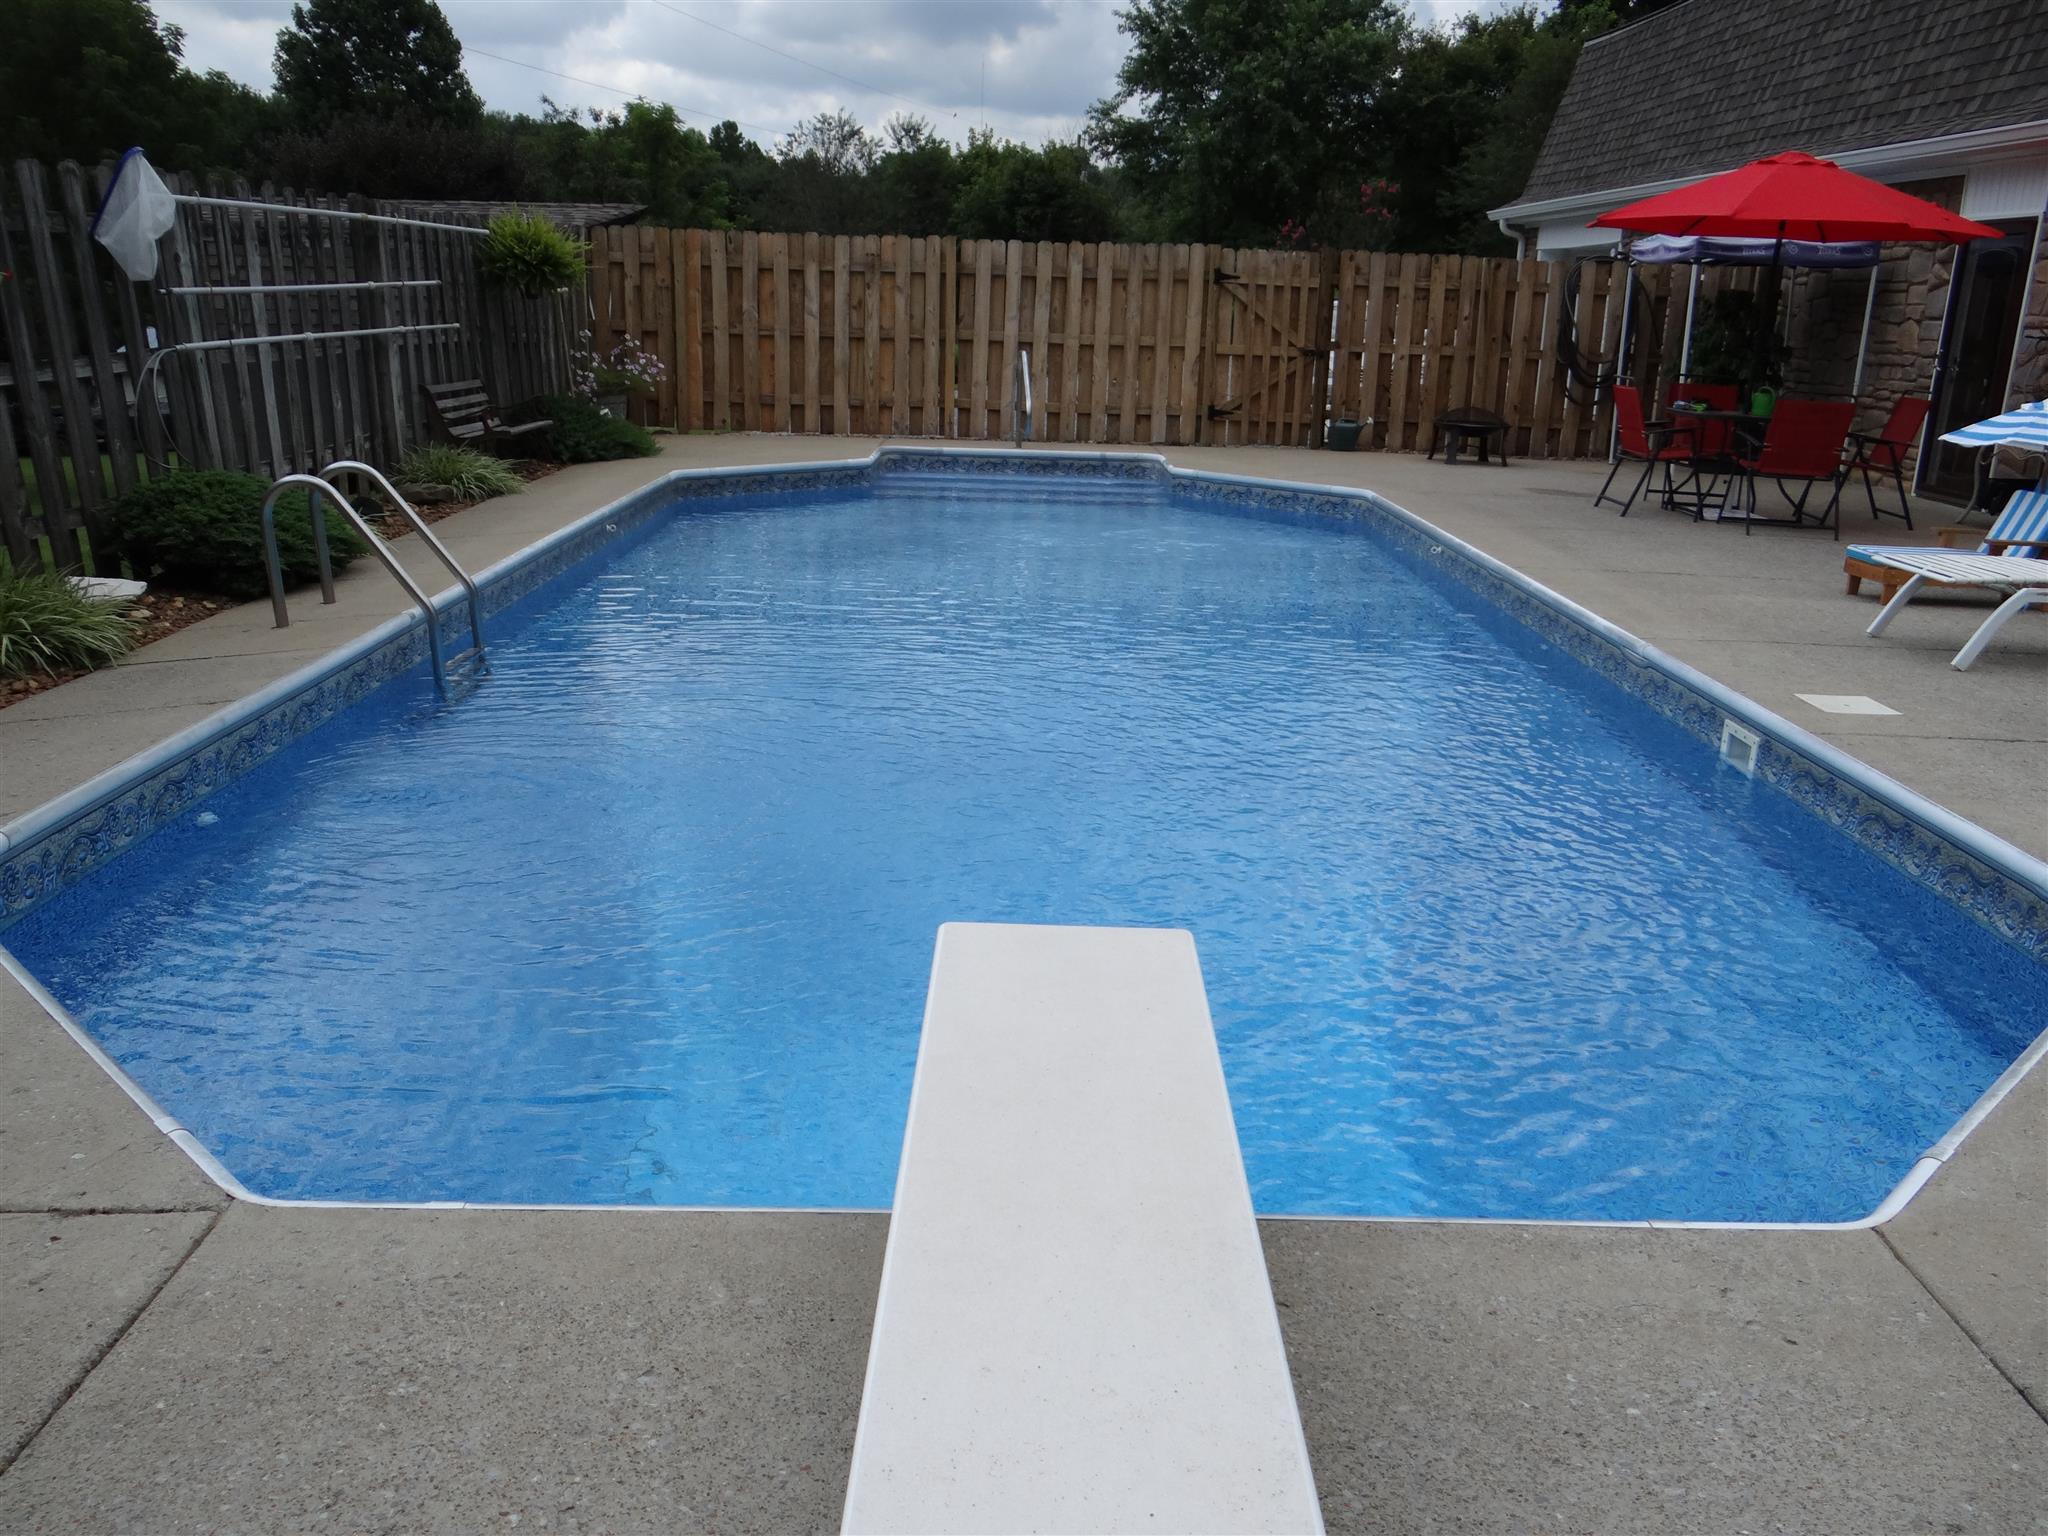 8181 Cedar Grove Rd, Cross Plains, TN 37049 - Cross Plains, TN real estate listing